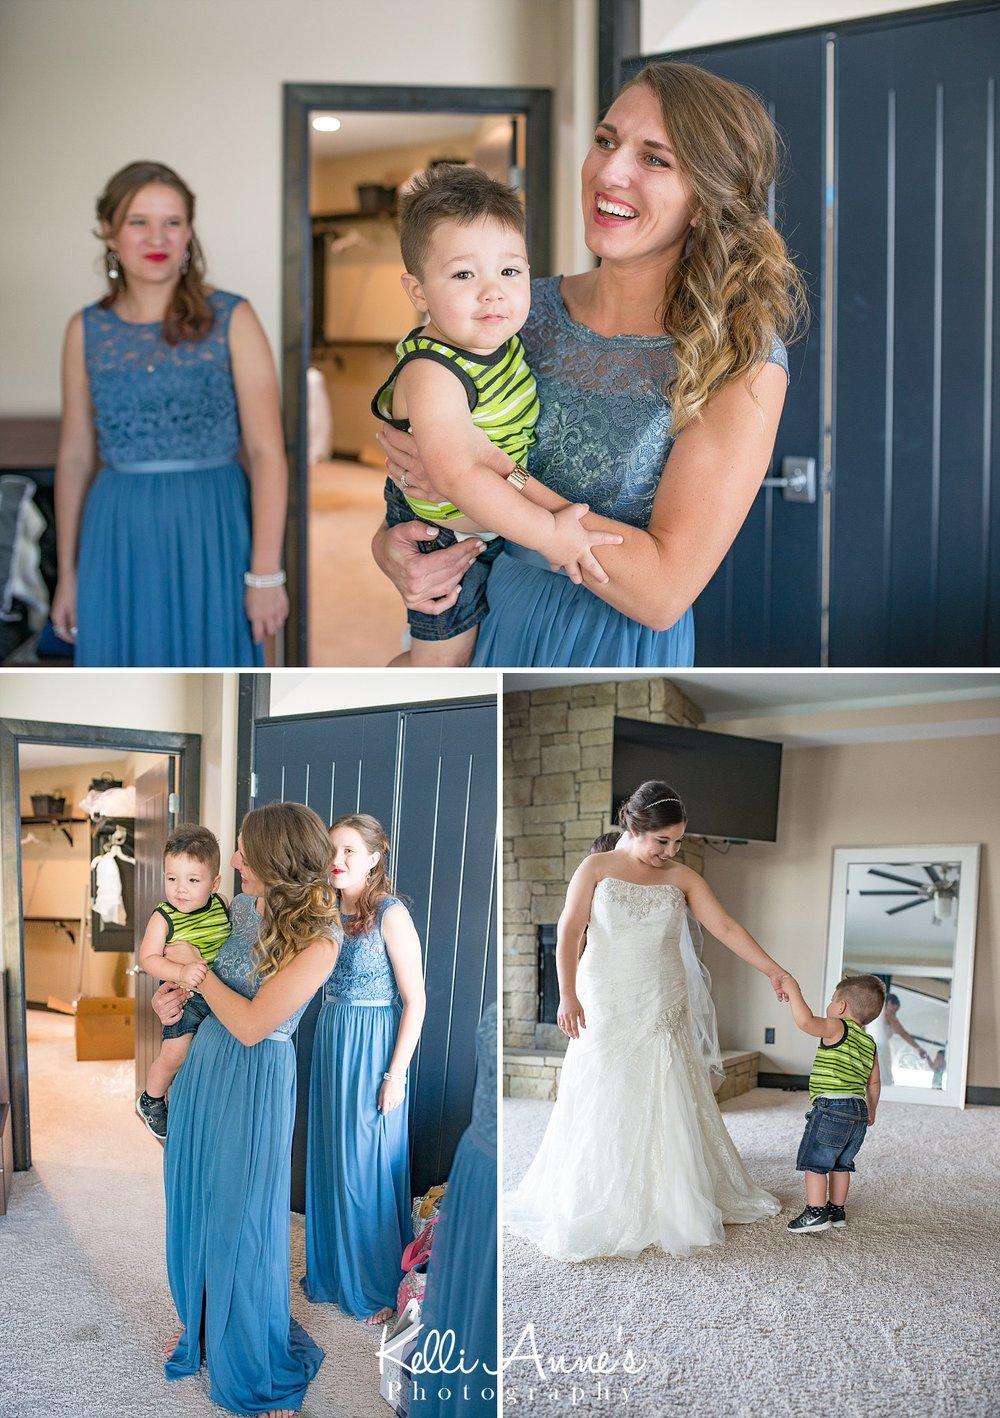 First Look, Mother Son, Bride, little boy, bridesmaids, bridal suit, Sunset Bluffs, washington mo